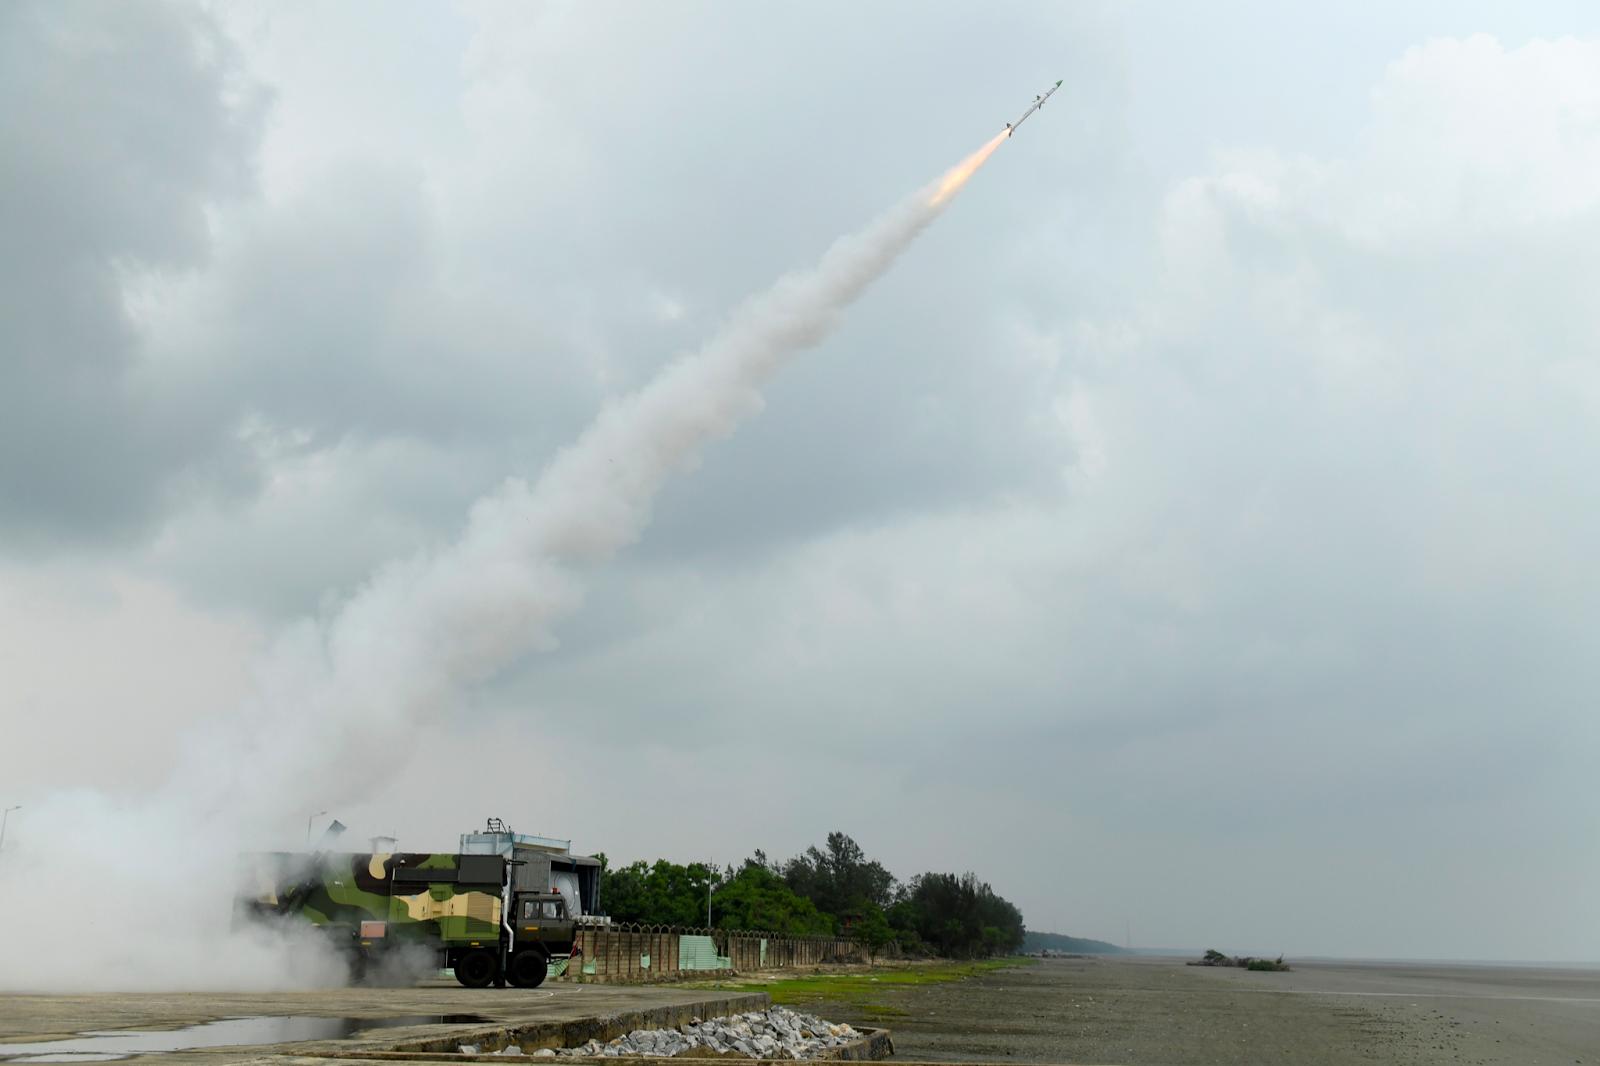 drdo-successfully-flight-tests-surface-to-air-missile-akash-ng